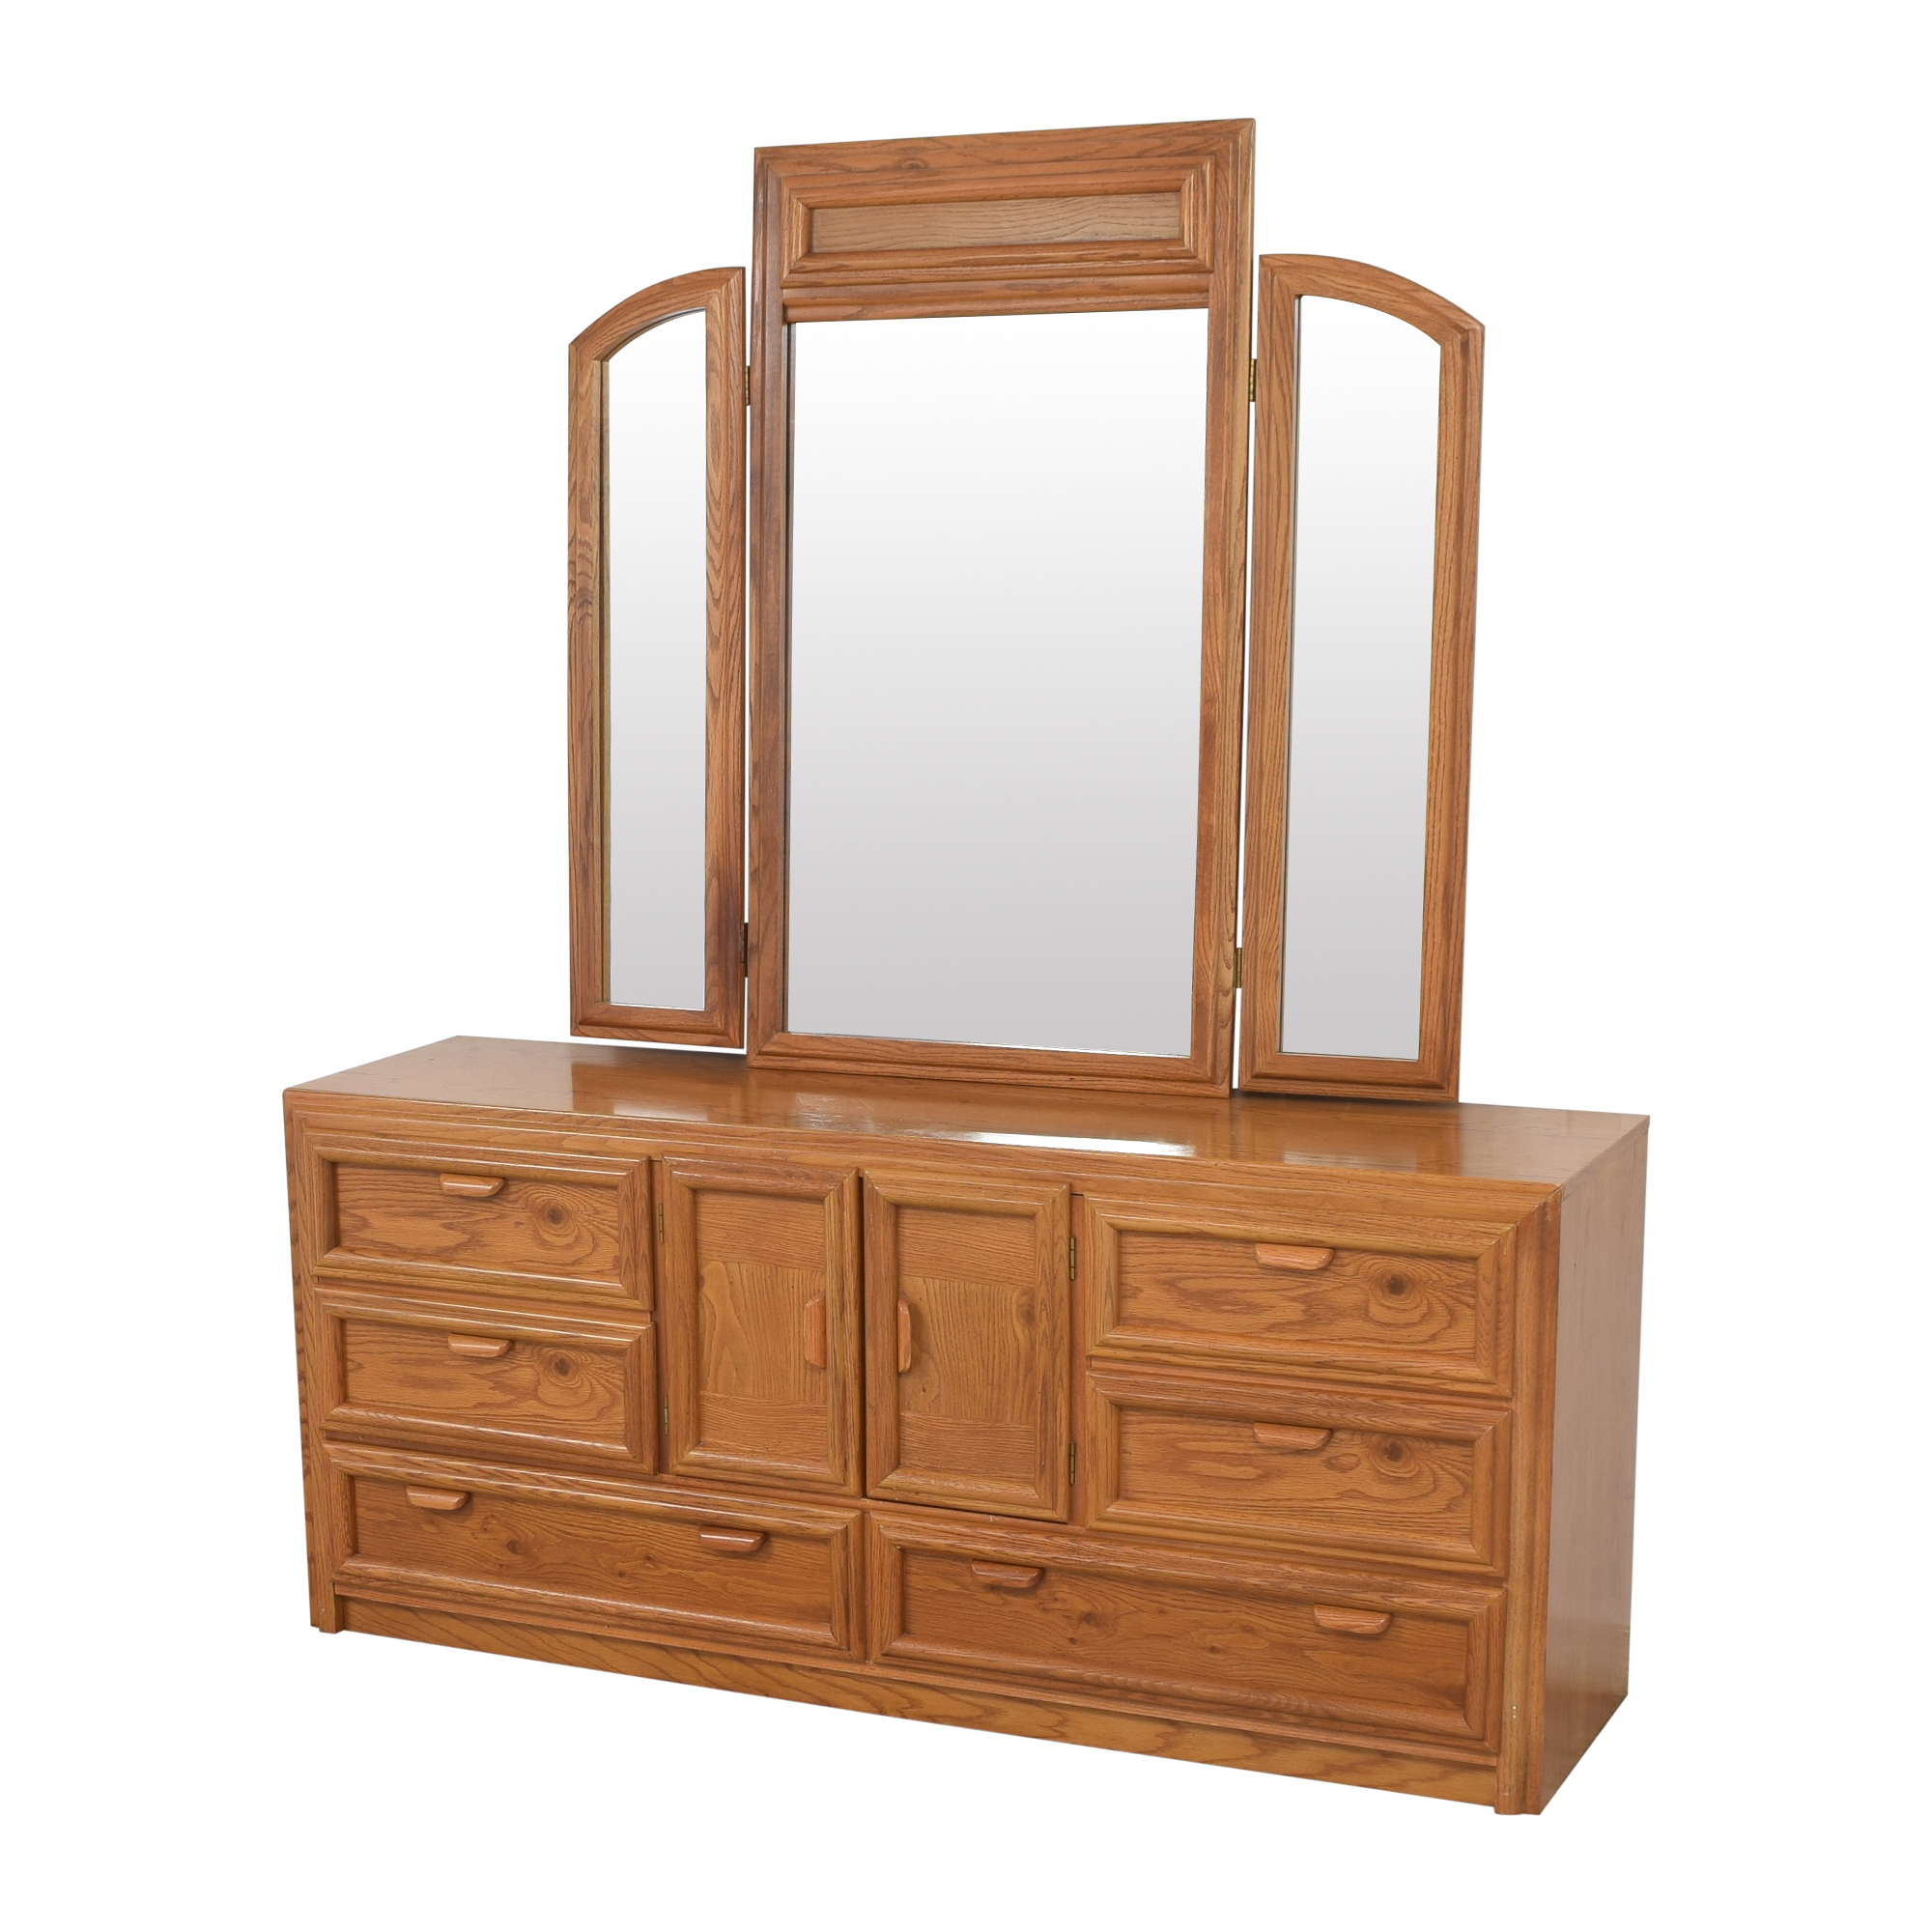 Bassett Furniture Bassett Triple Dresser With Trifold Mirror  dimensions